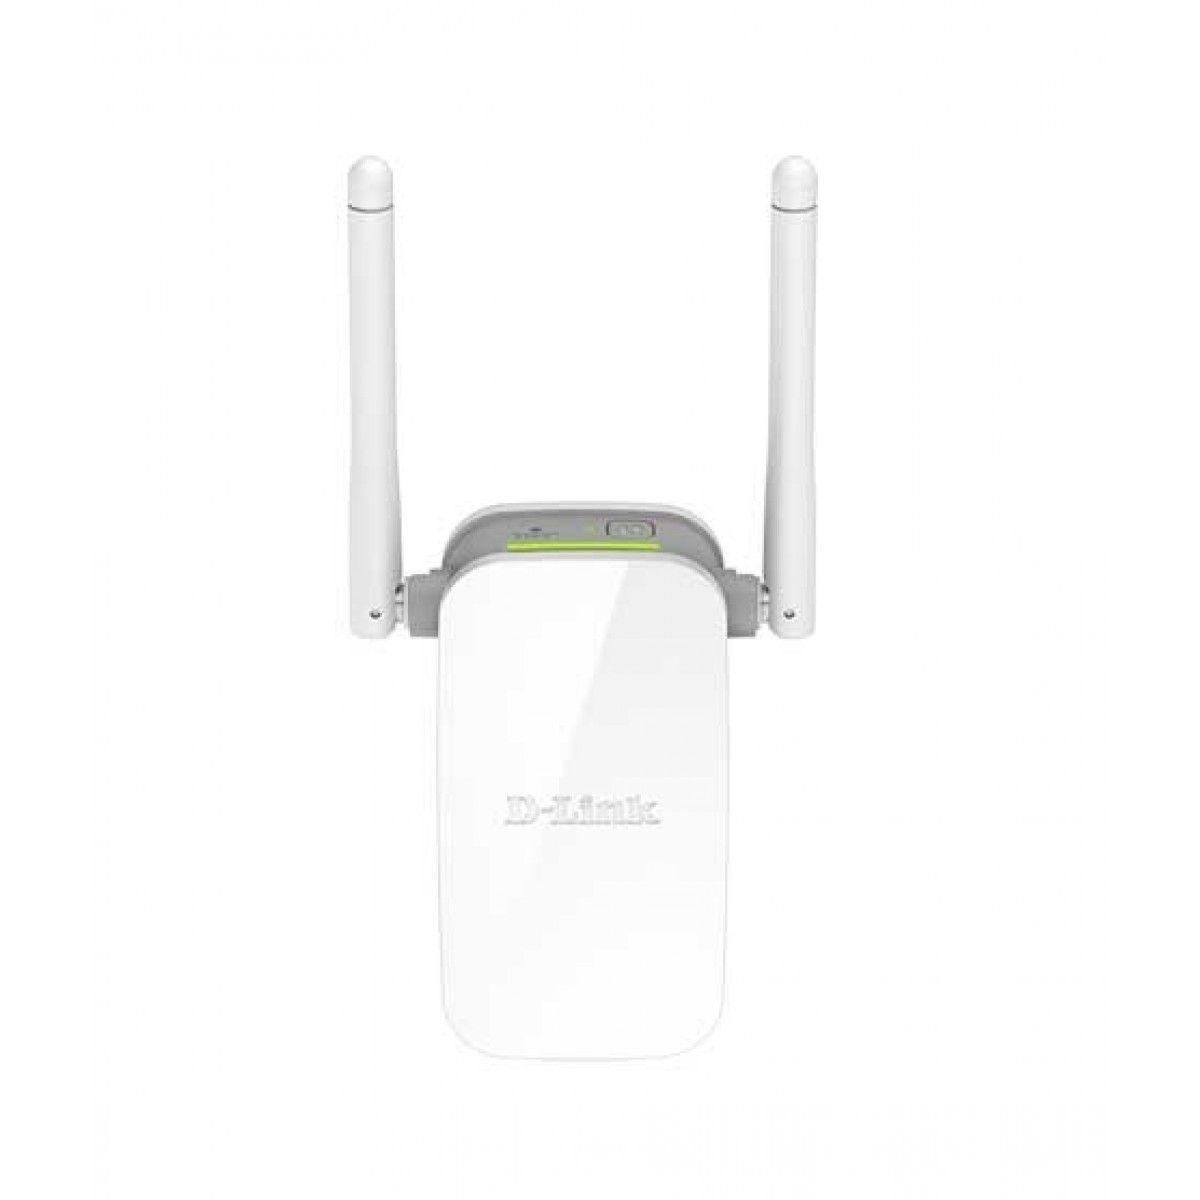 D-Link N300 Wi-Fi Range Extender (DAP-1325)